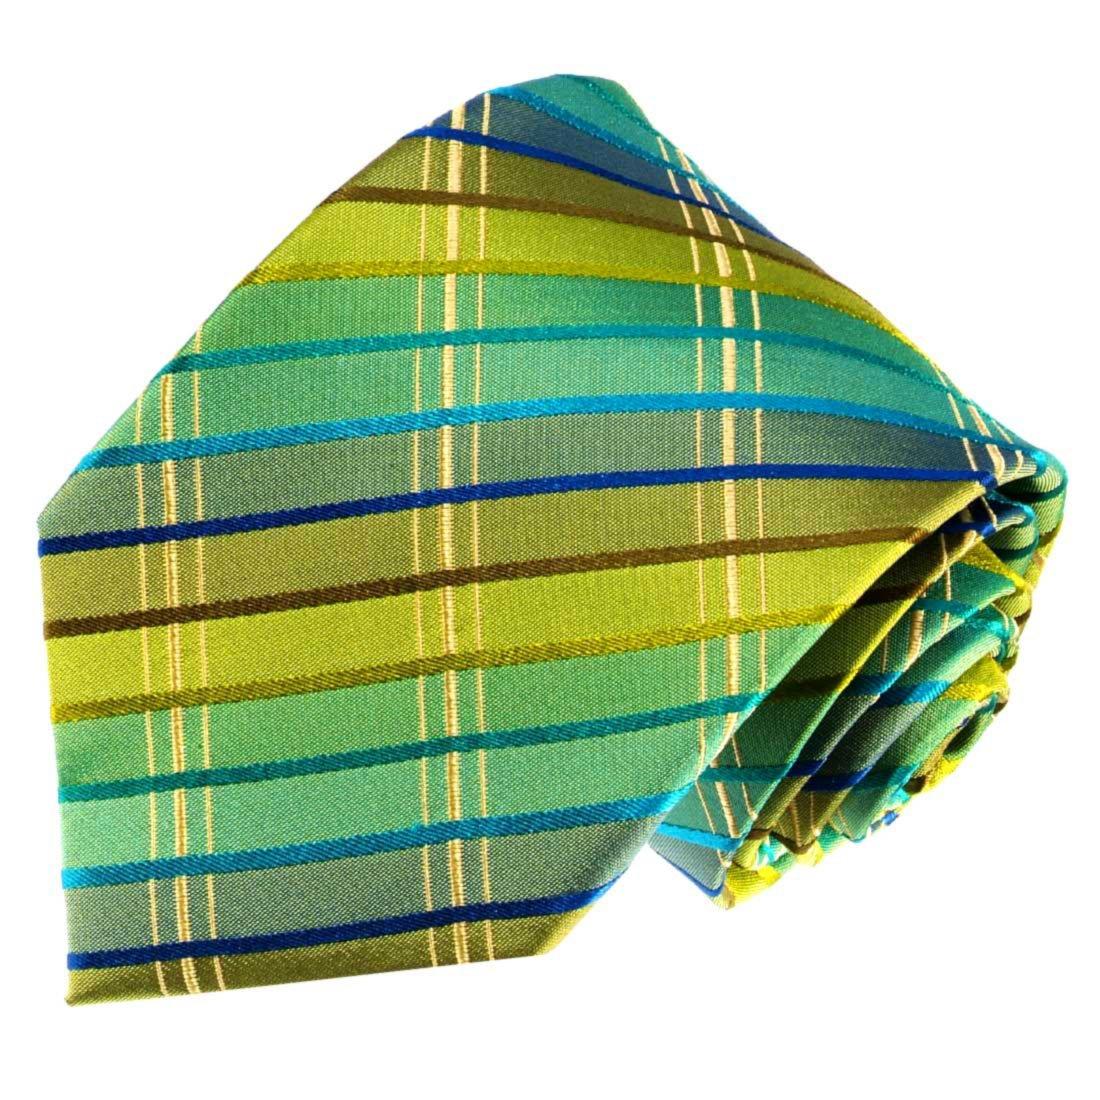 Lorenzo Cana - Exklusive Designer Krawatte aus 100% Seide - Seidenkrawatte grün türkis blau gold kariert Karos - 77106